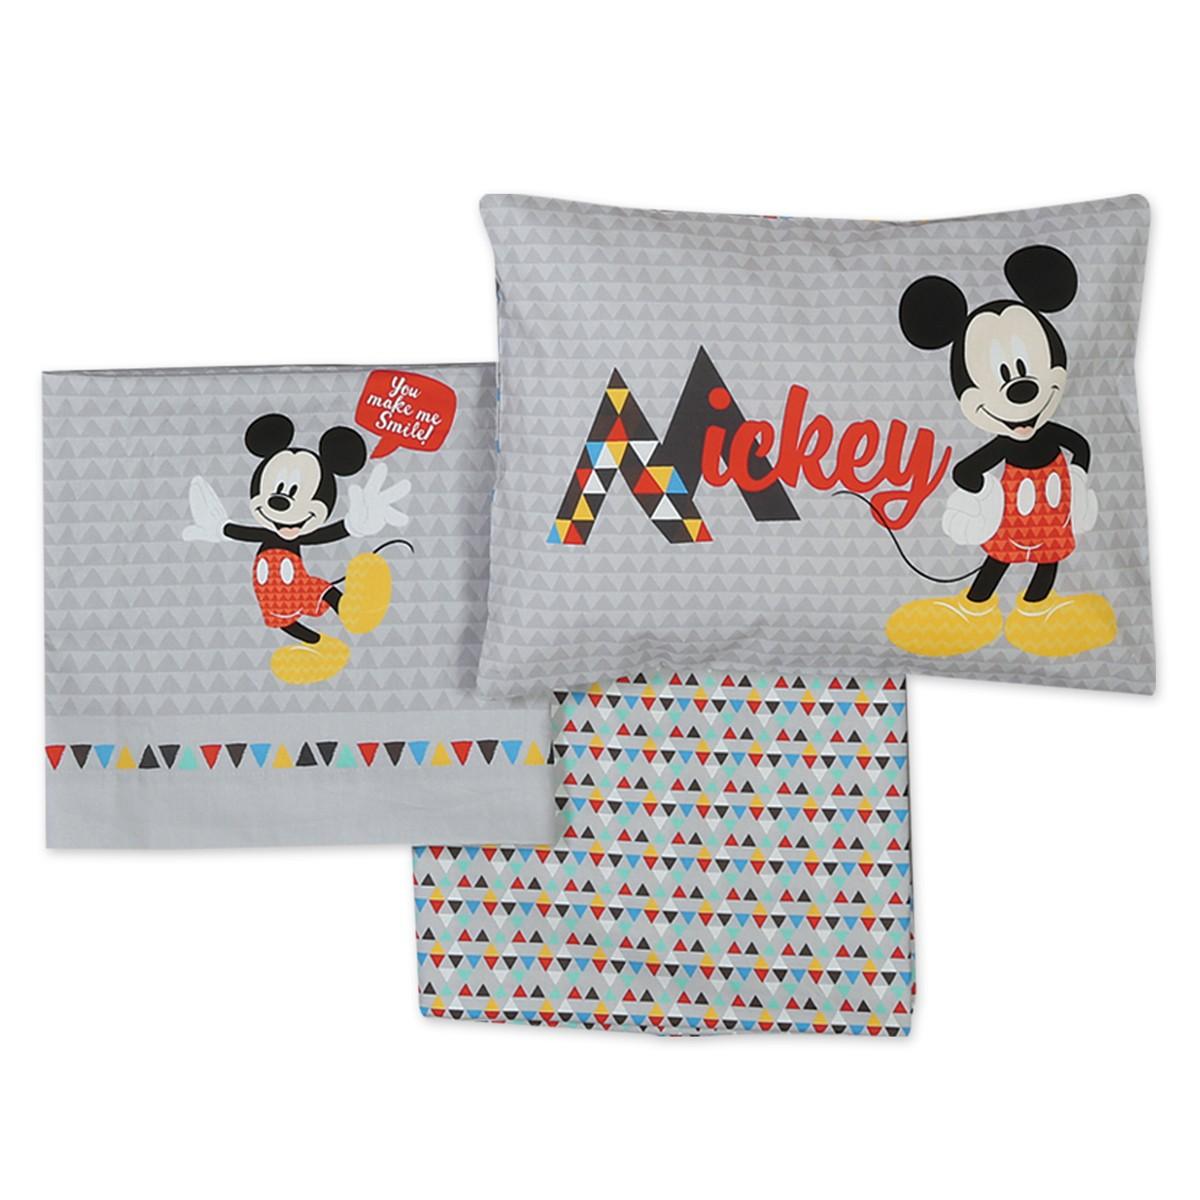 3ac165e94ab -50% Spiti Shop Σεντόνια Κούνιας (Σετ) Nef-Nef Disney Mickey Smile